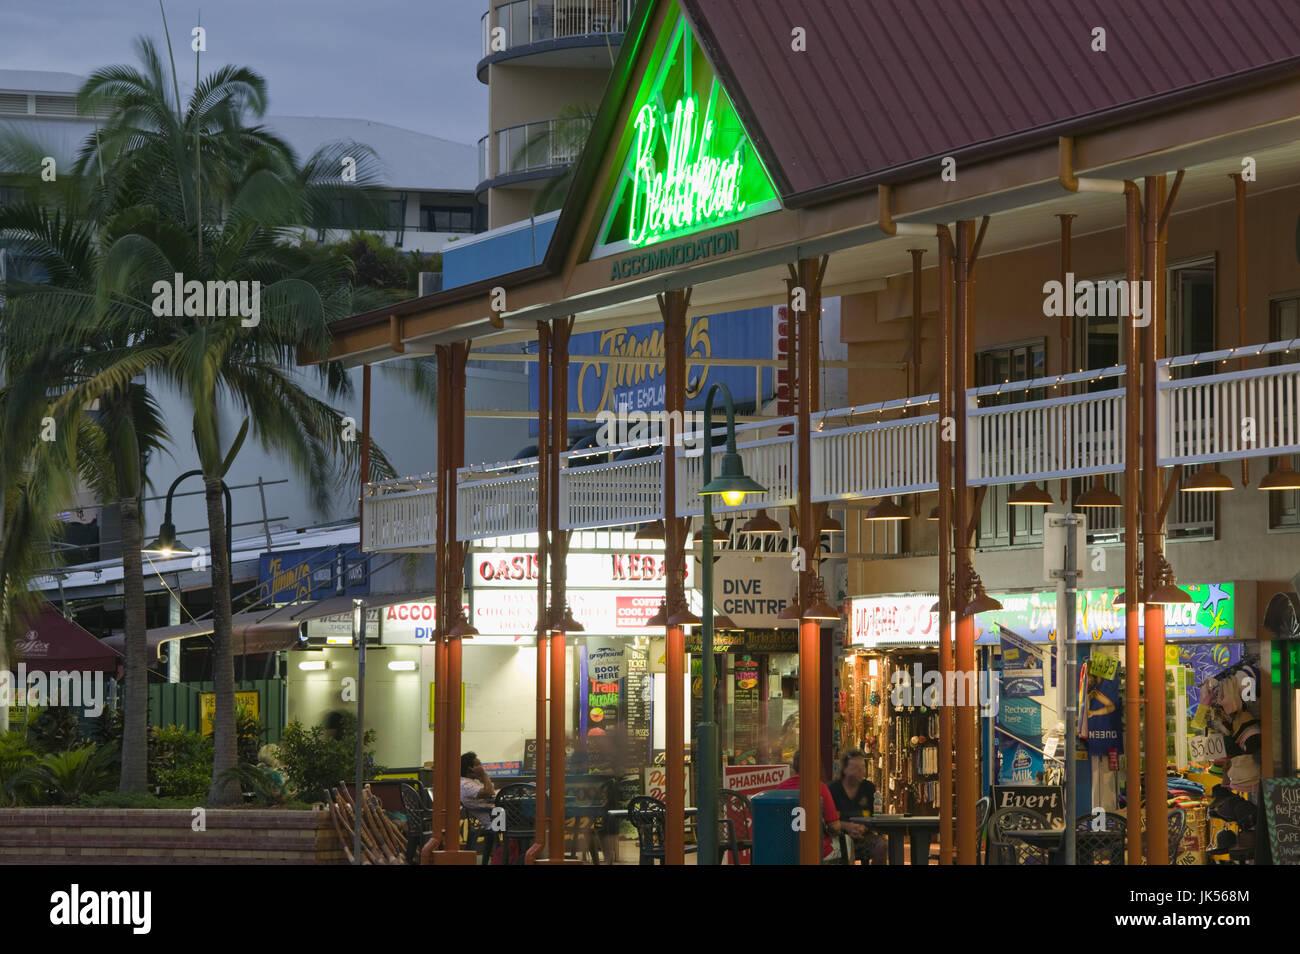 Australia, Queensland, North Coast, Cairns, Evening View of the Esplanade, Stock Photo